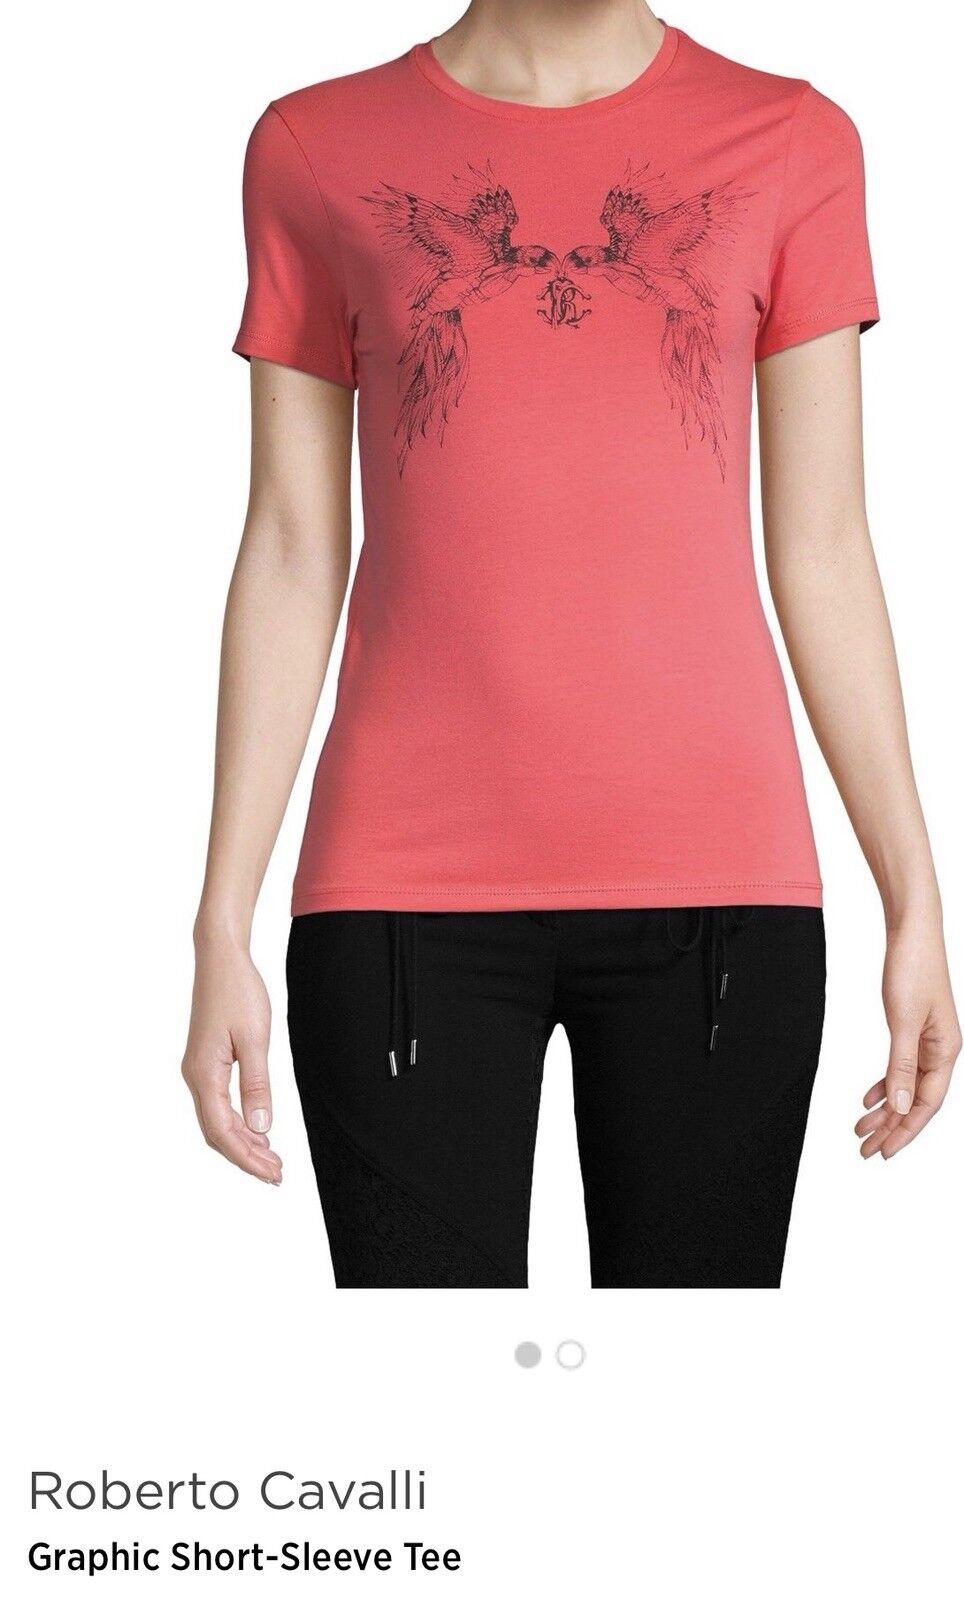 Roberto Cavalli daMänner's Perrot Kurz Sleeve T-Hemd Sz XS Farbe Coral